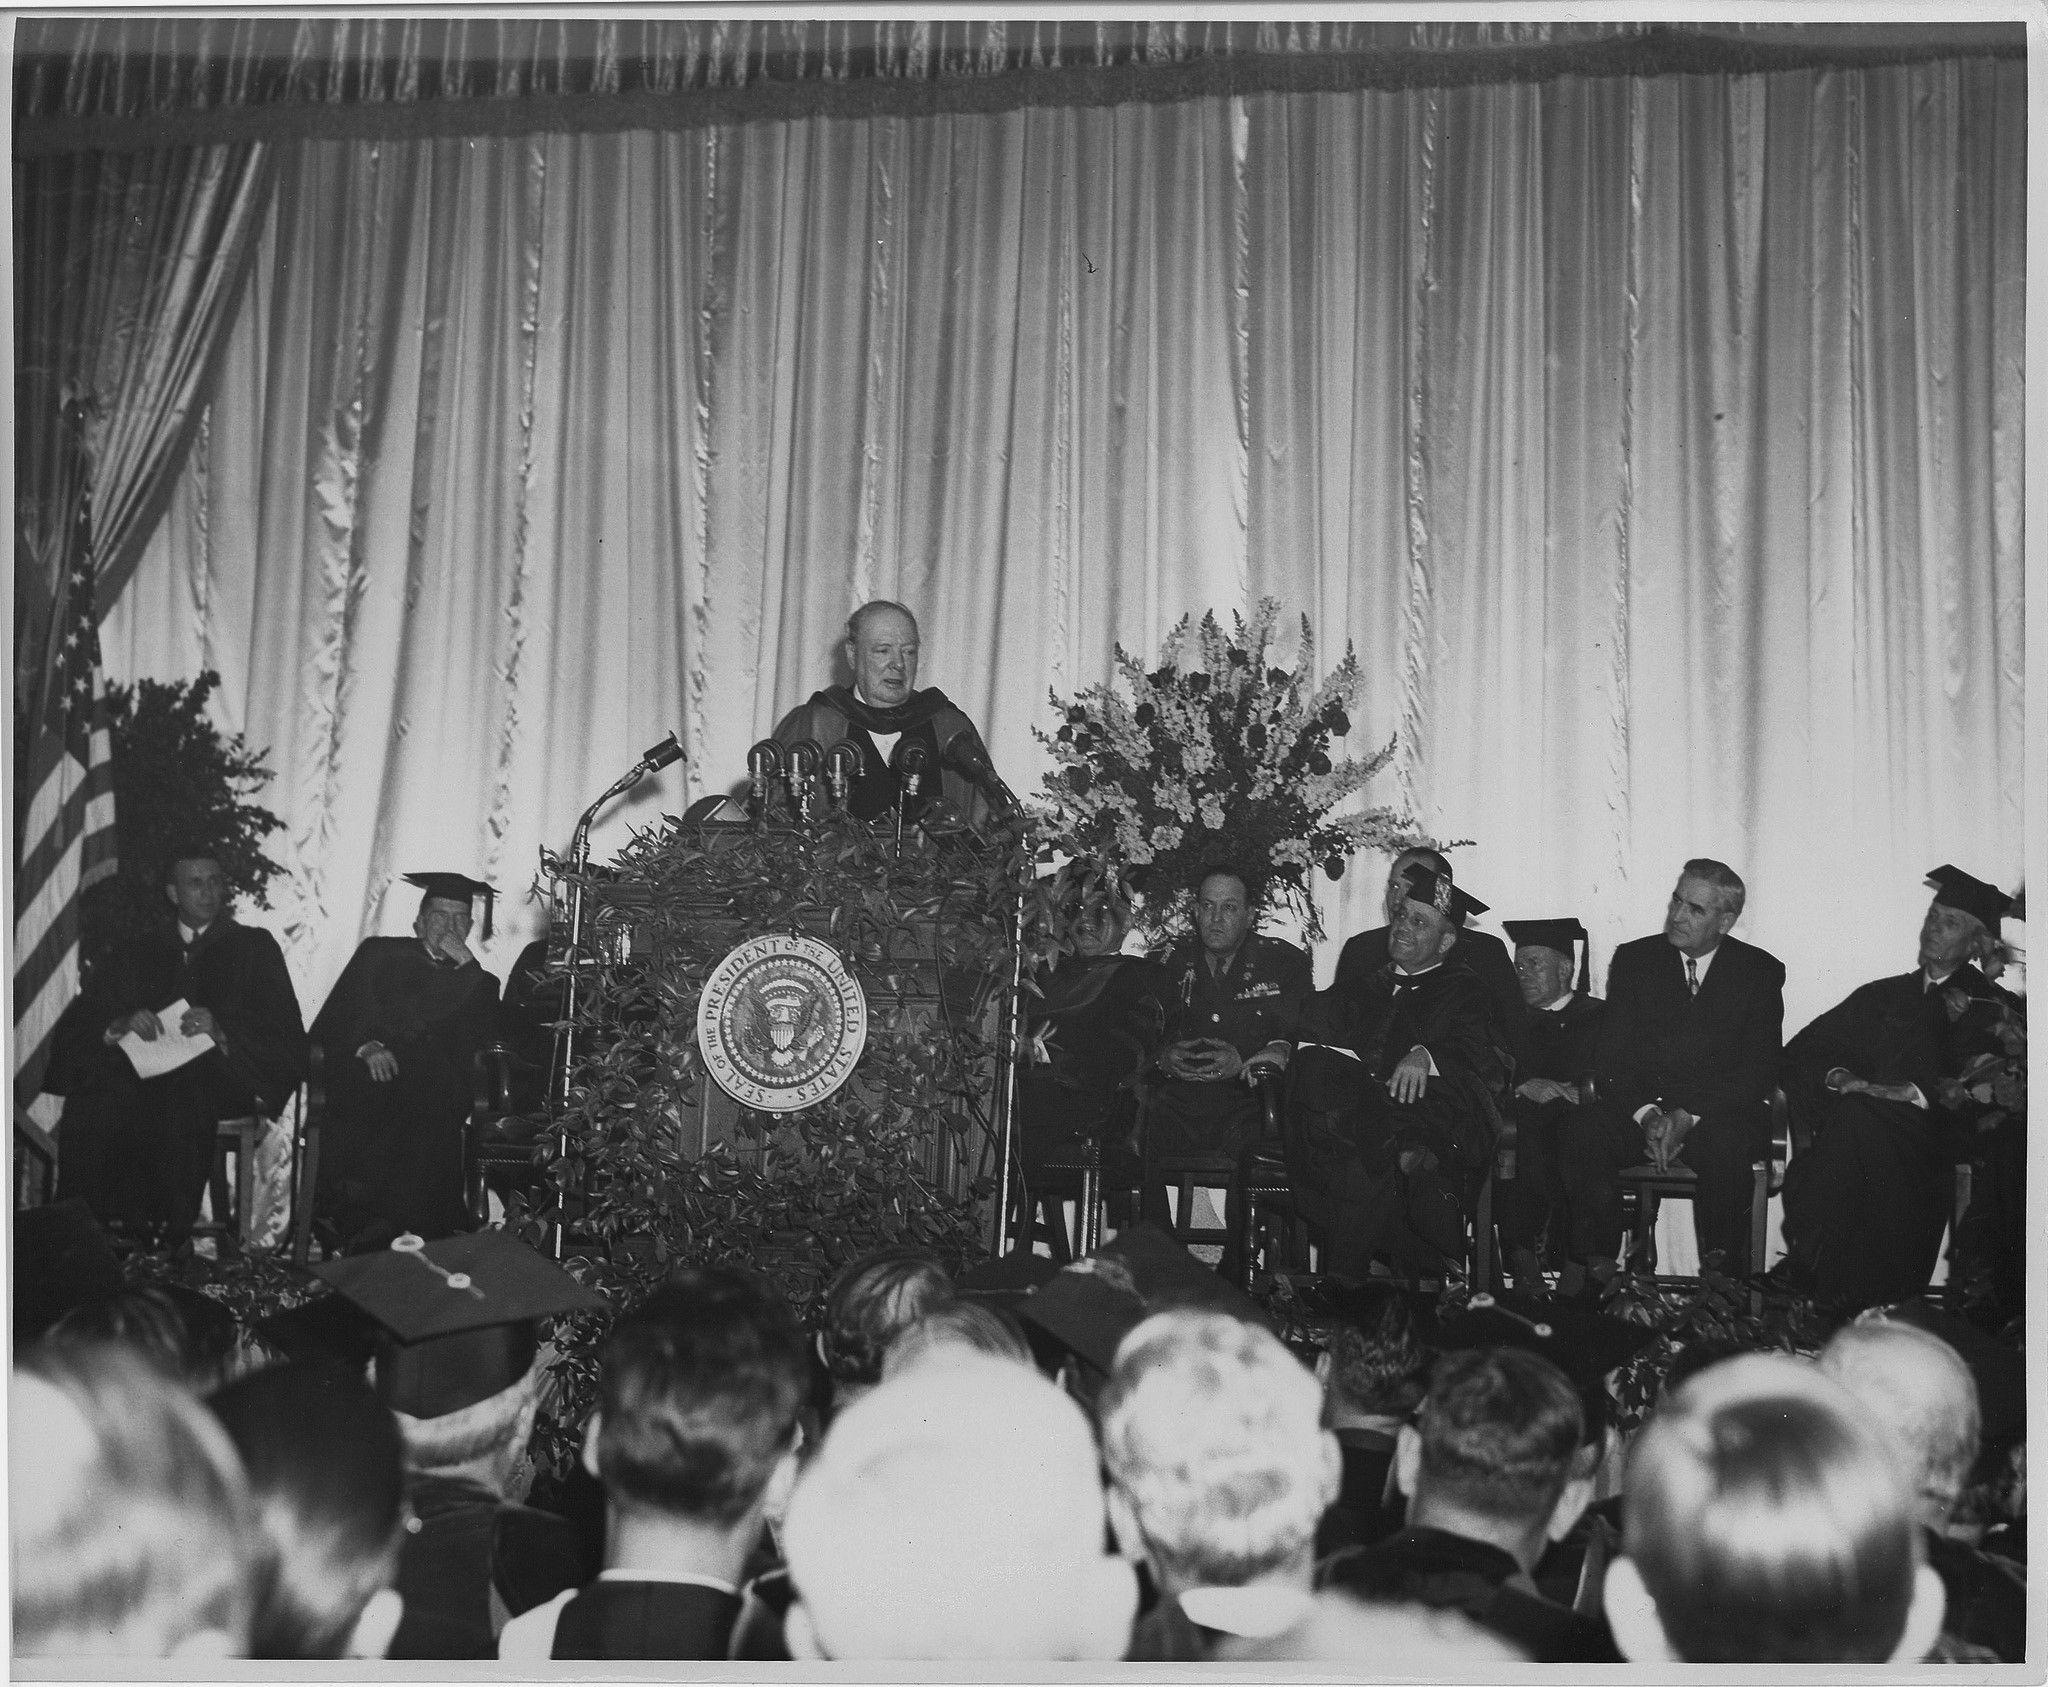 Churchill iron curtain speech cartoon - Political Winston Churchill Iron Curtain Speech At Westminster College 1946 Churchill Condemns